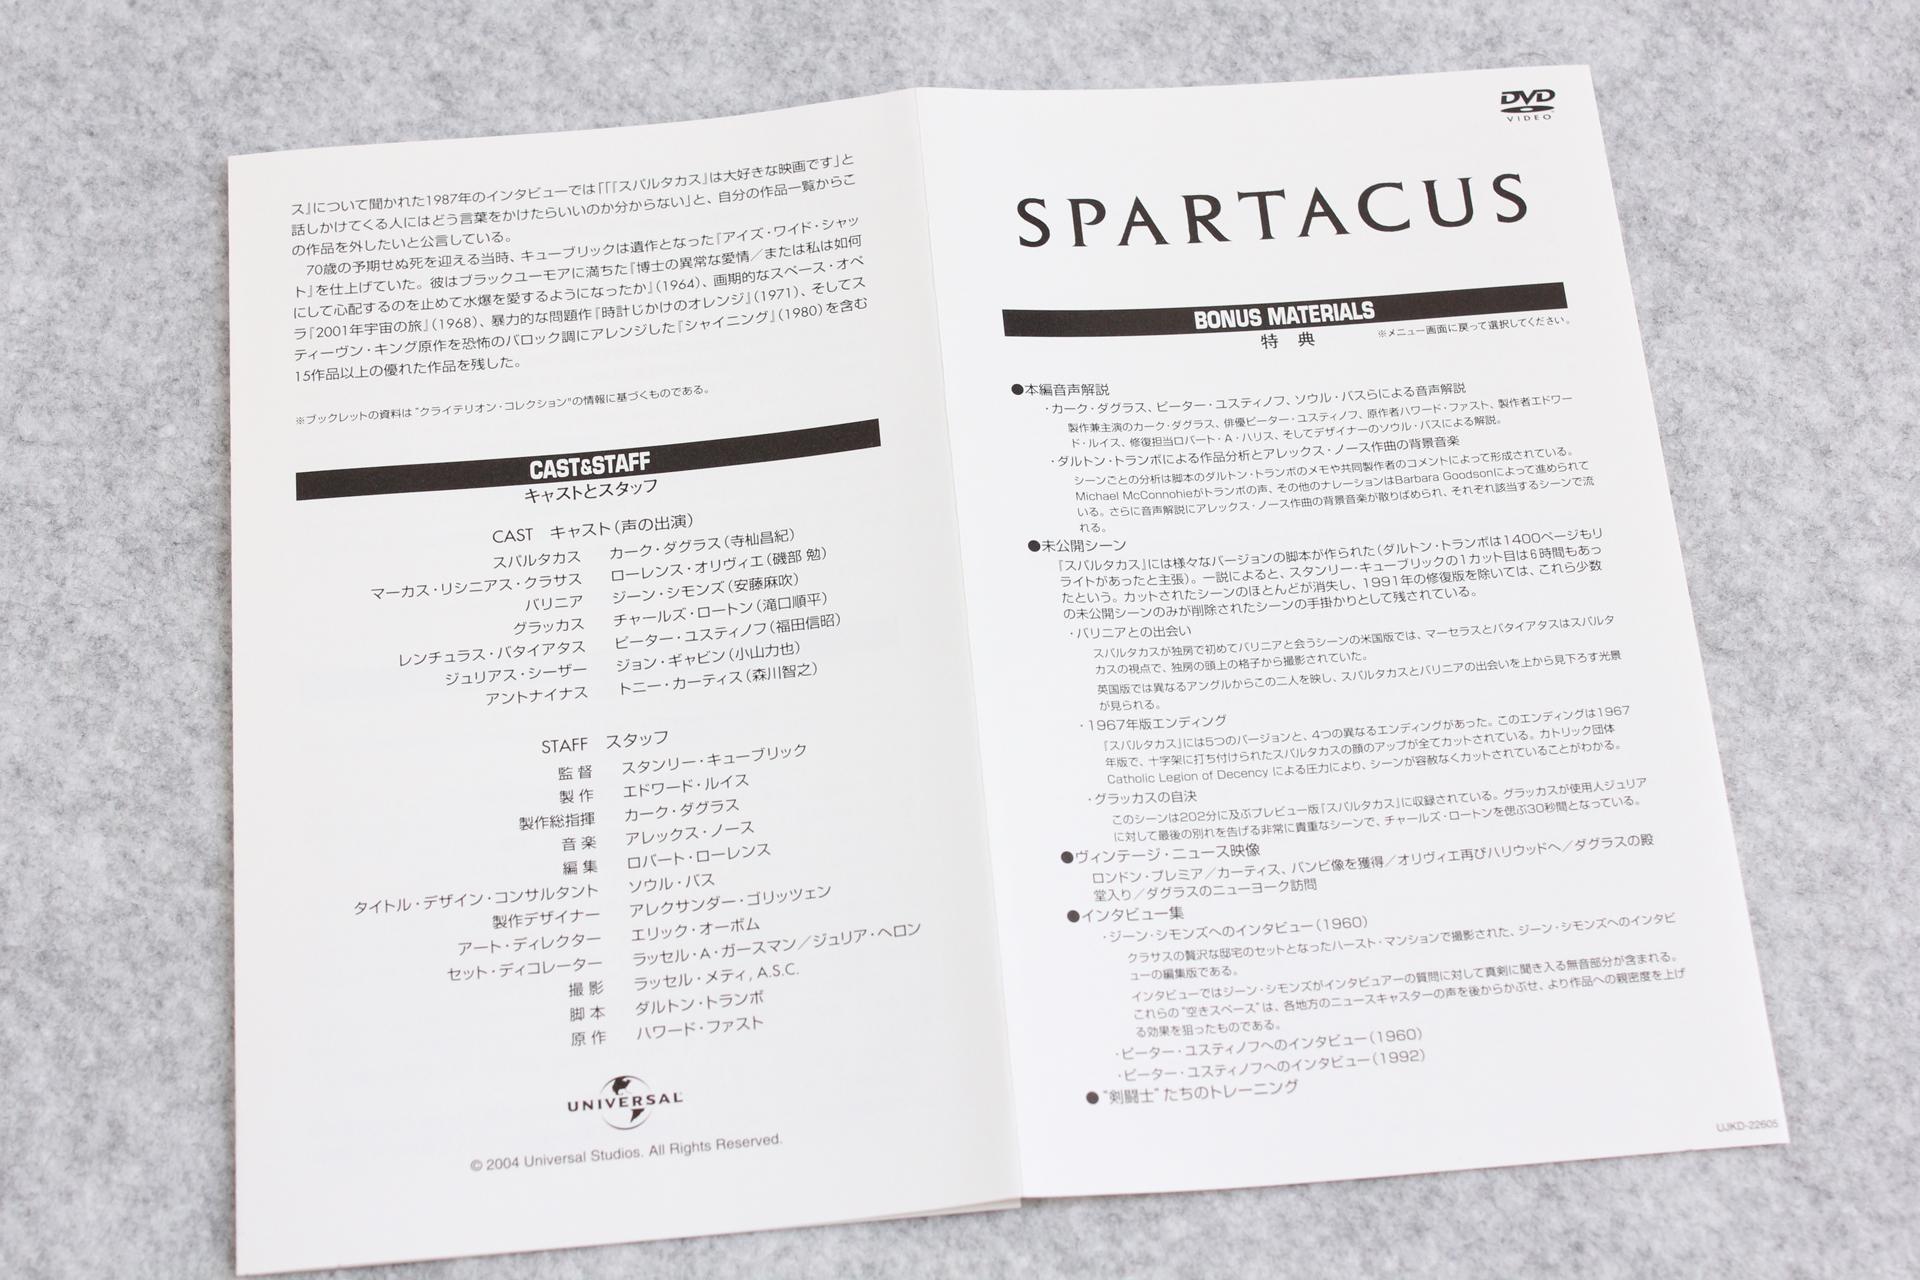 2020-11-05-SPARTACUS_UHD-8.JPG